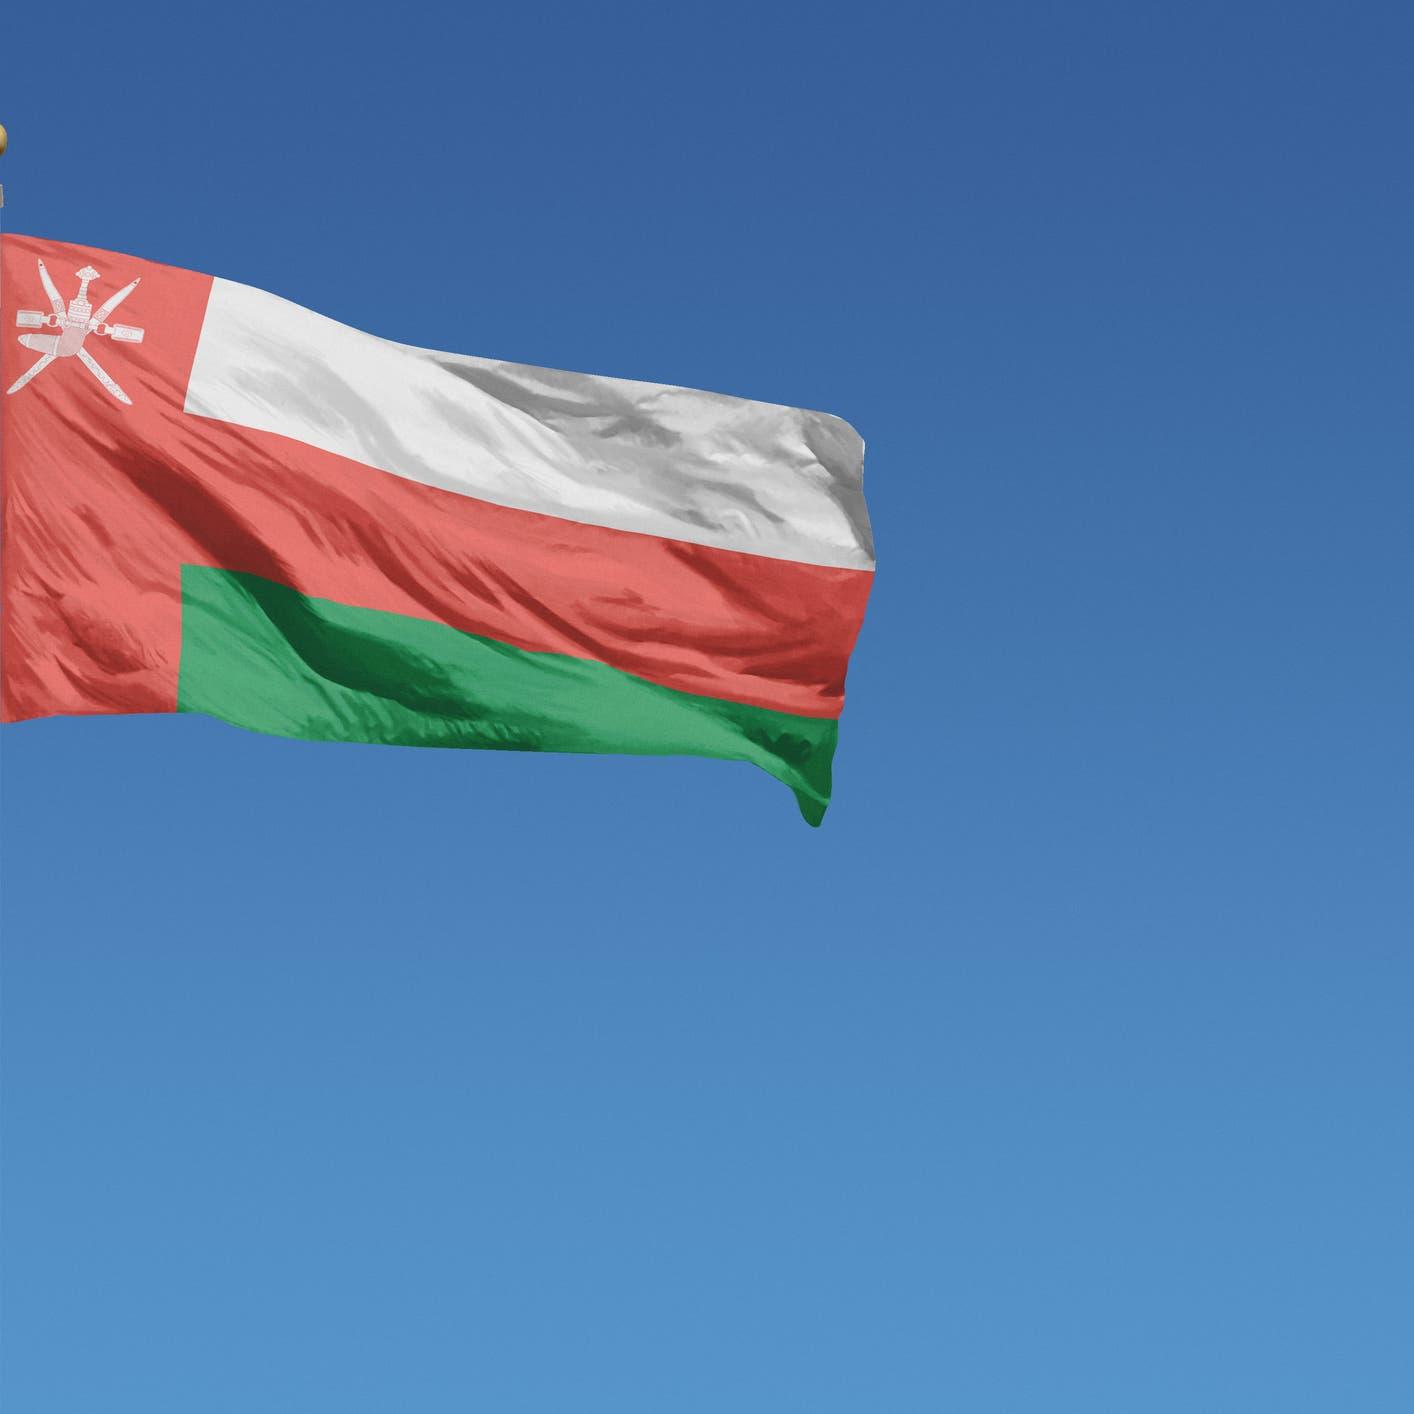 Rare protests in Oman over jobs draw massive police response